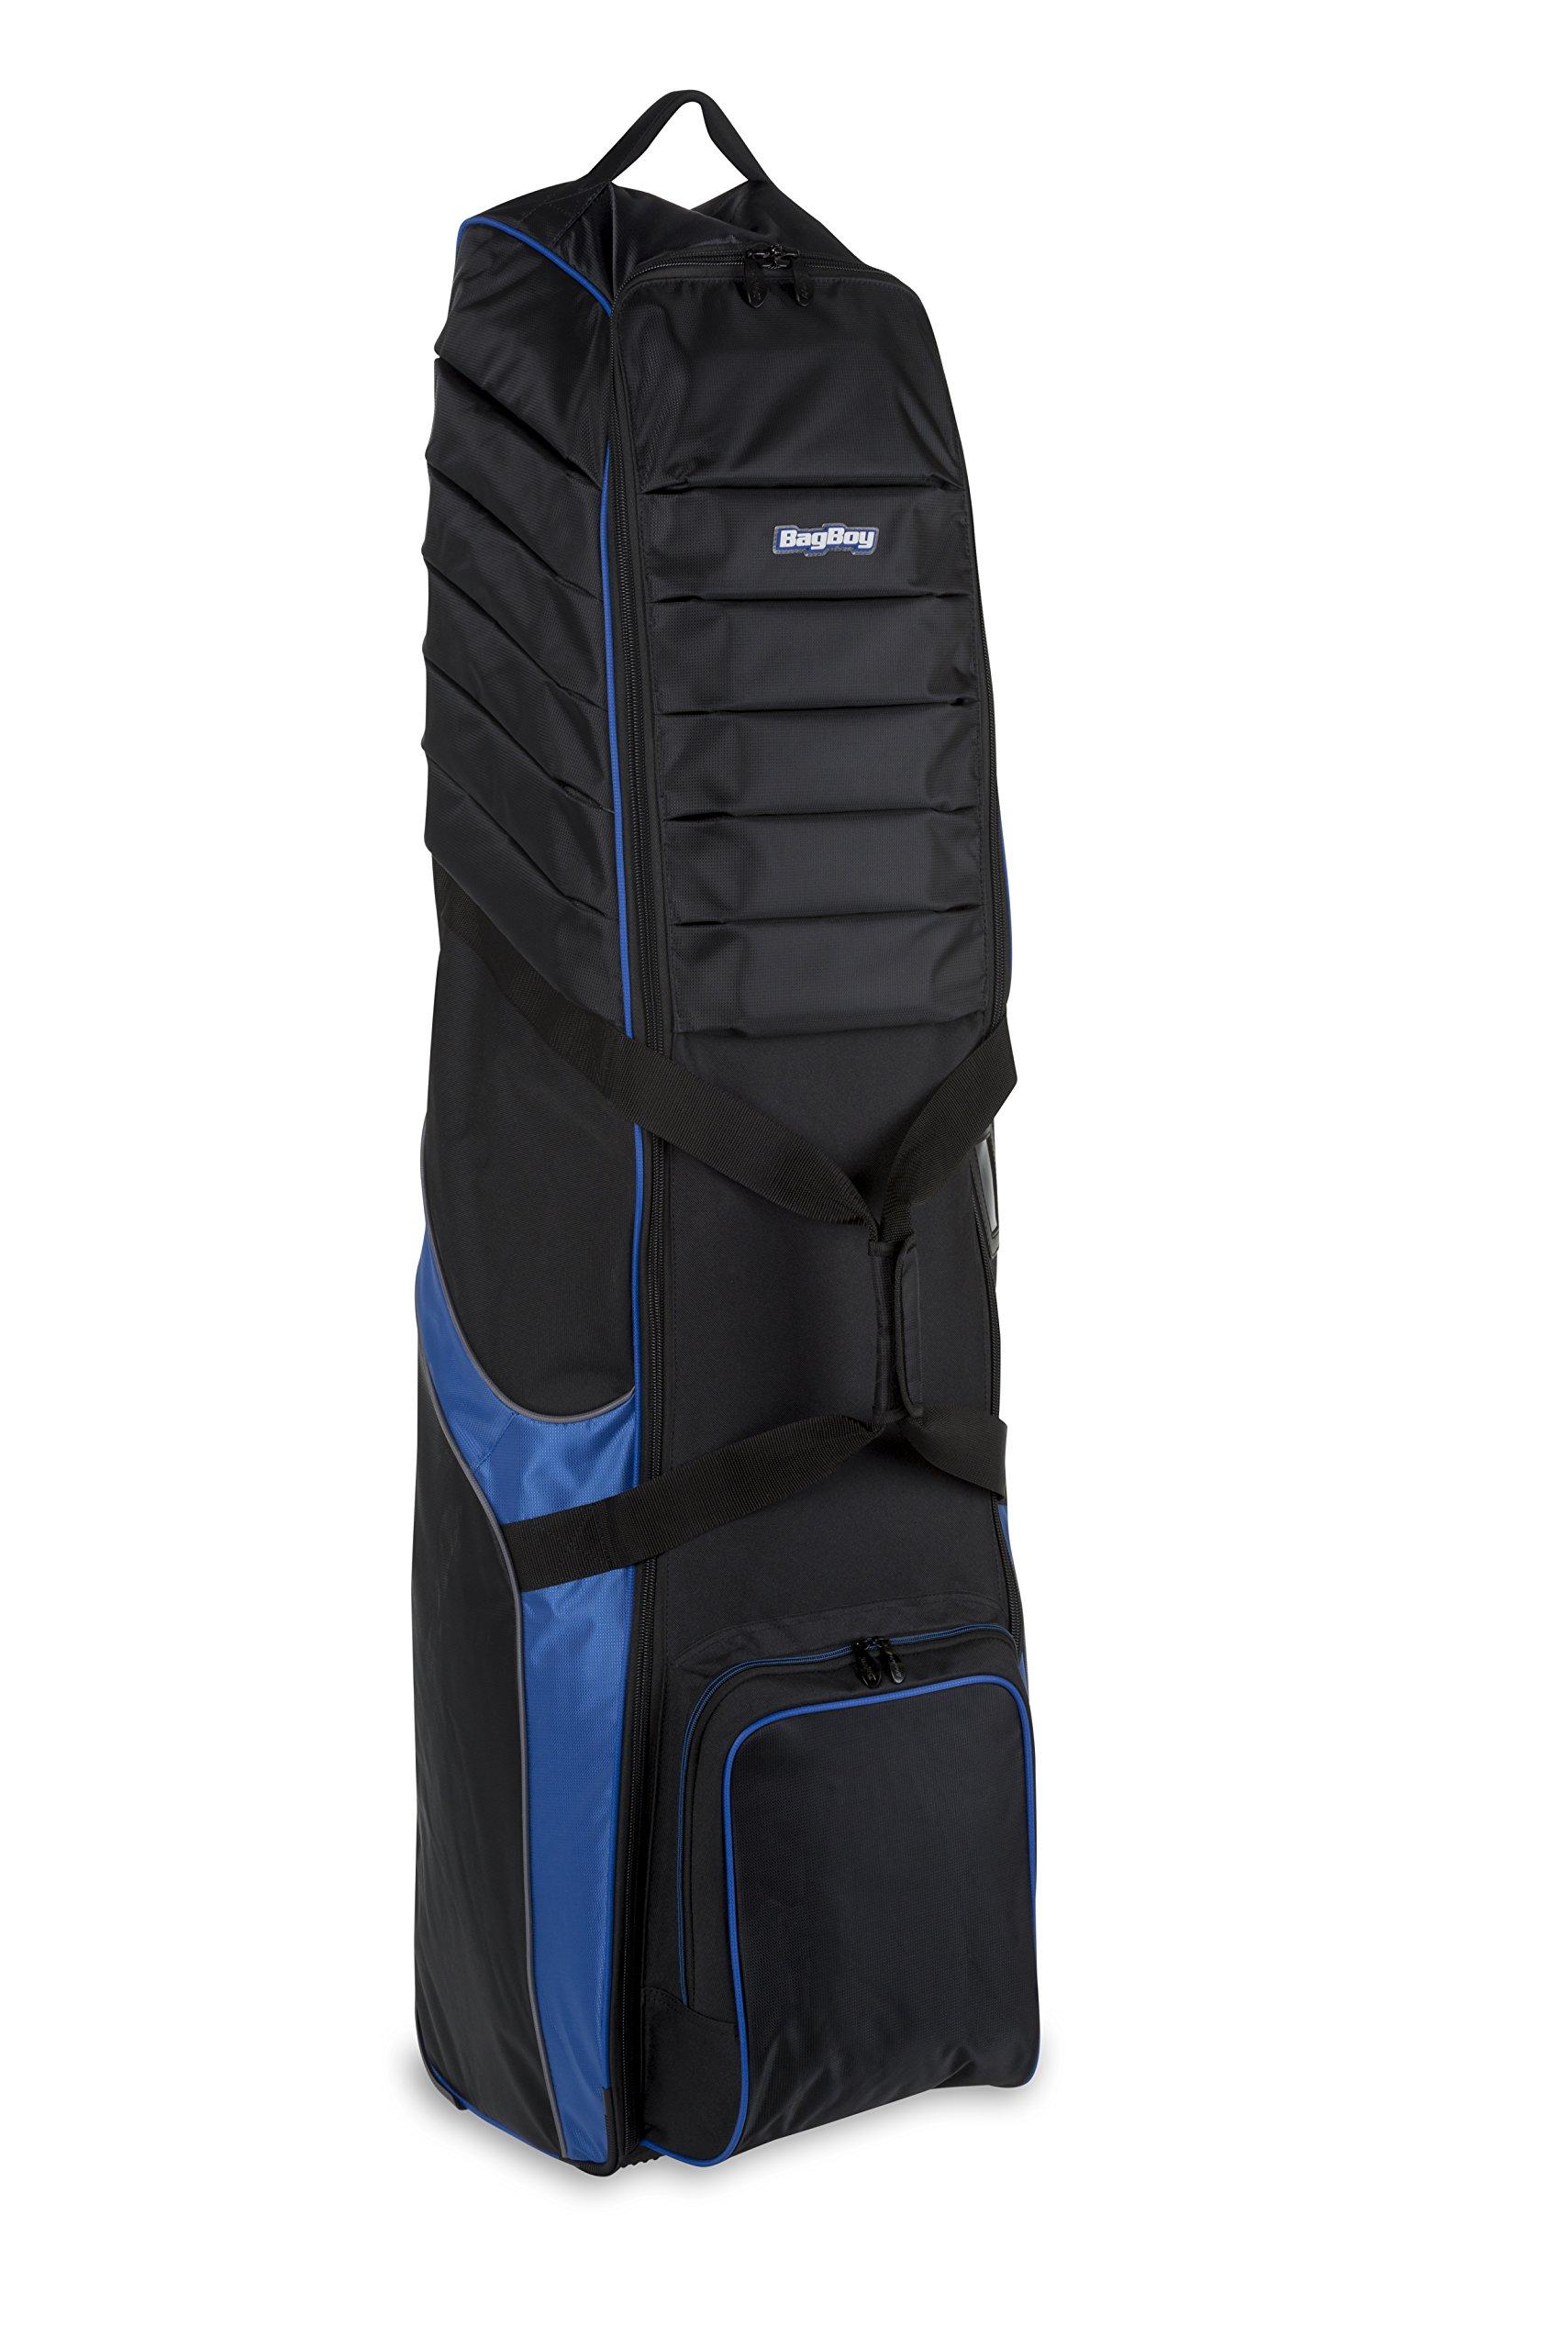 Bag Boy T-750 Wheeled Travel Cover Black/Royal by Bag Boy